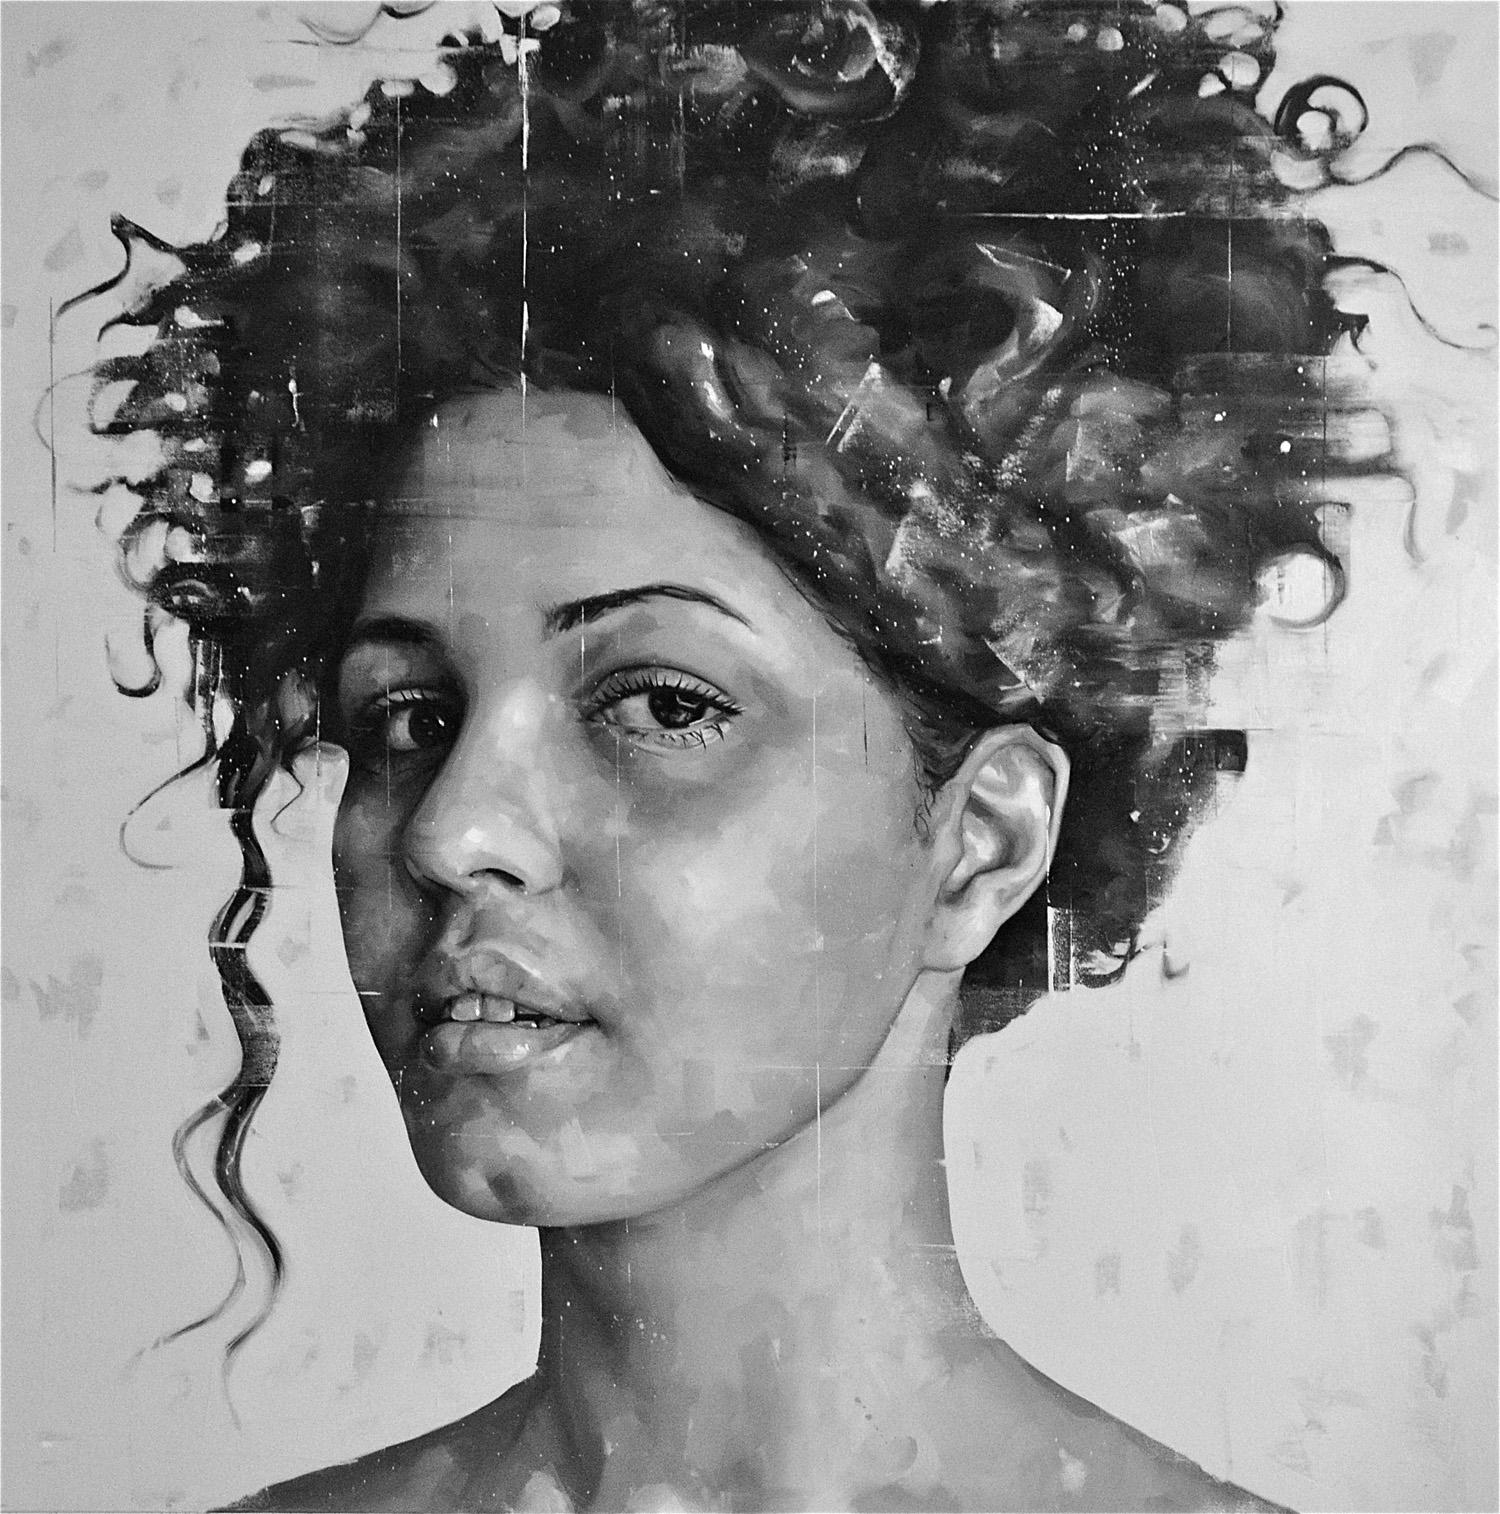 Untitled 03 by Mr. Silvio Porzionato - Masterpiece Online